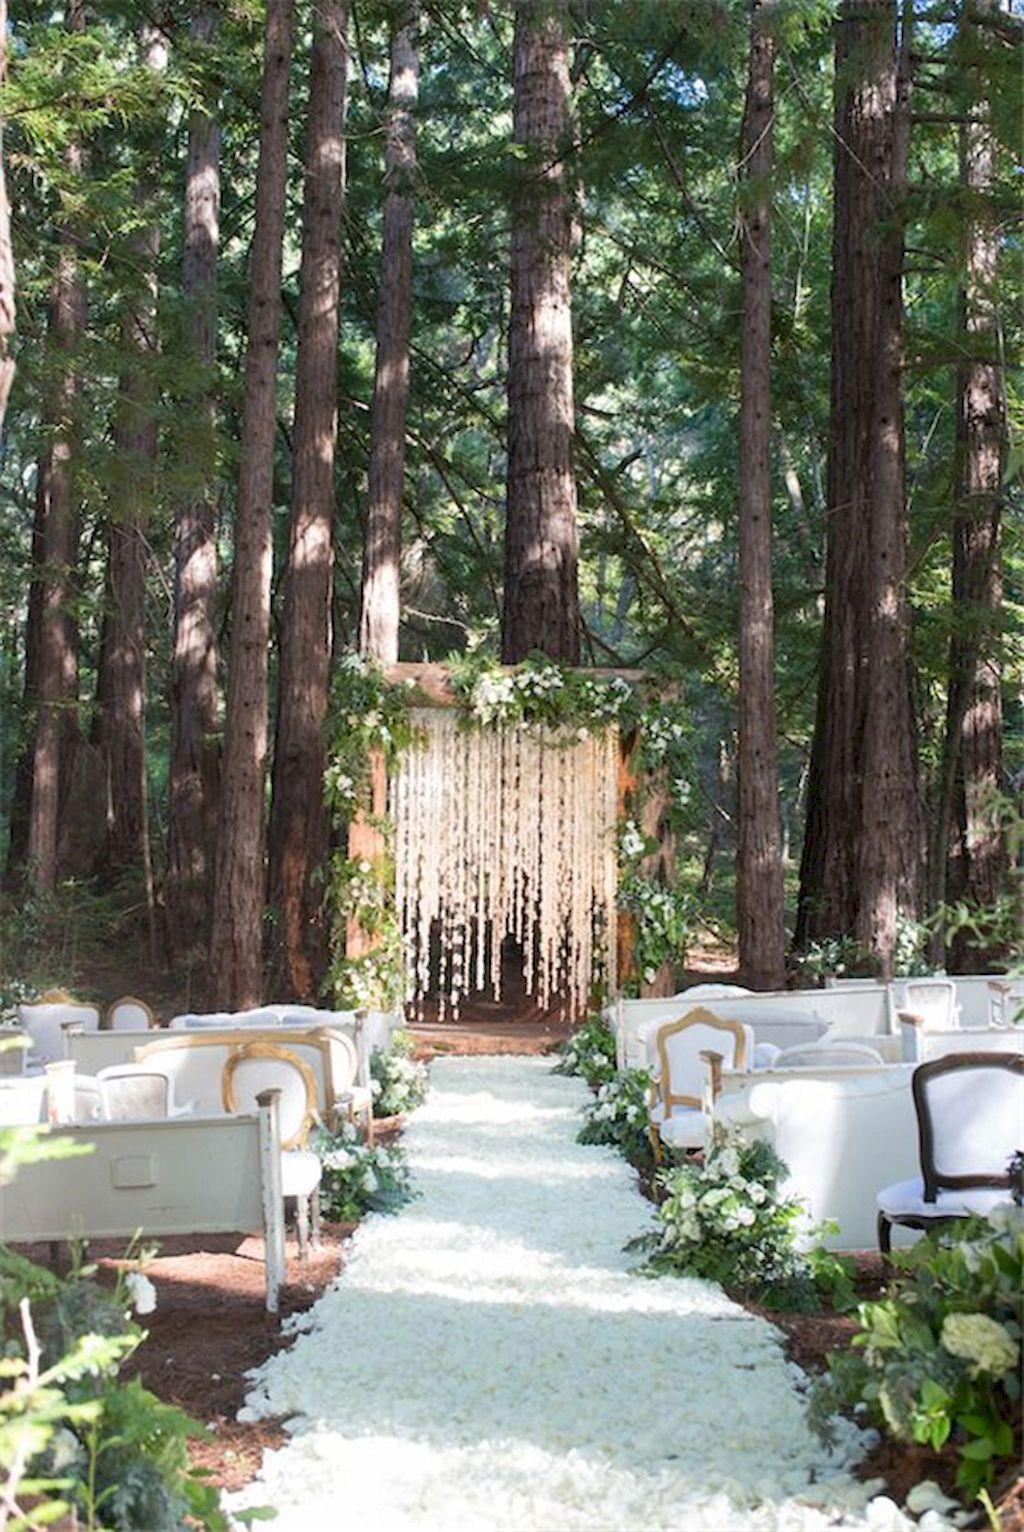 Outdoor wedding decoration ideas cheap   Elegant Outdoor Wedding Decor Ideas on A Budget  Wedding bells